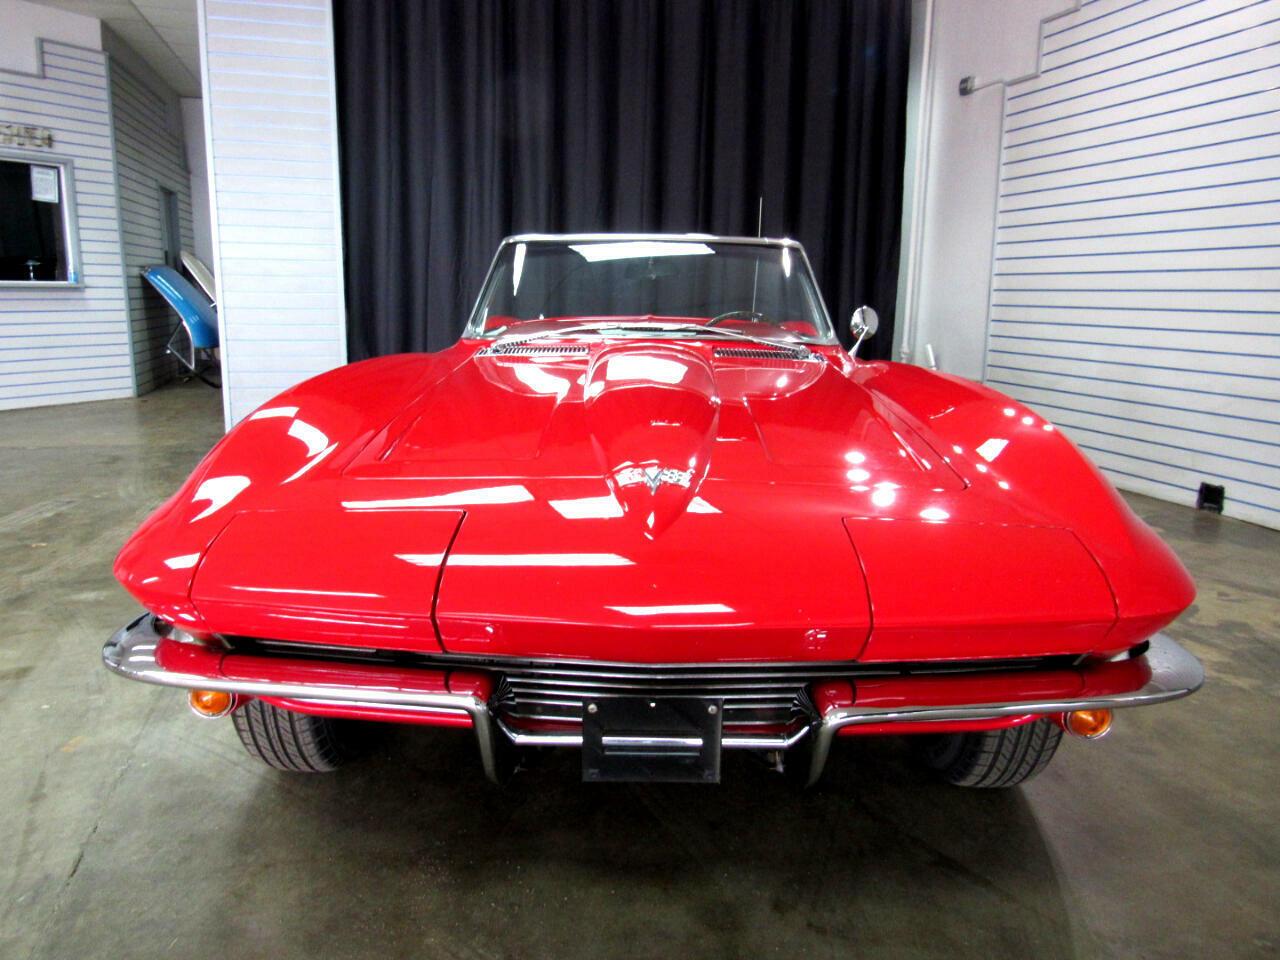 1964 Red Chevrolet Corvette Convertible  | C2 Corvette Photo 7